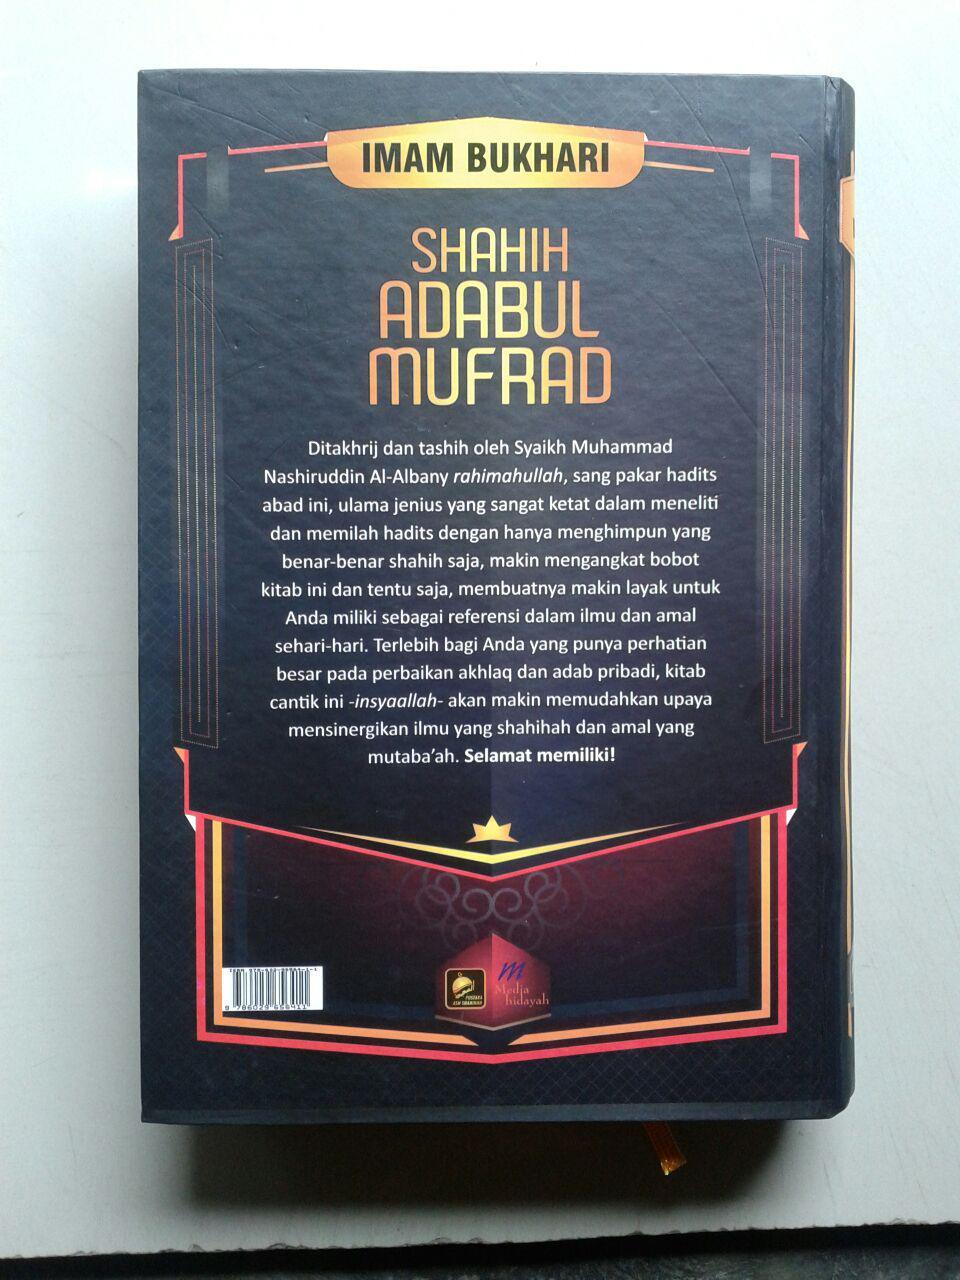 Buku Shahih Adabul Mufrad cover